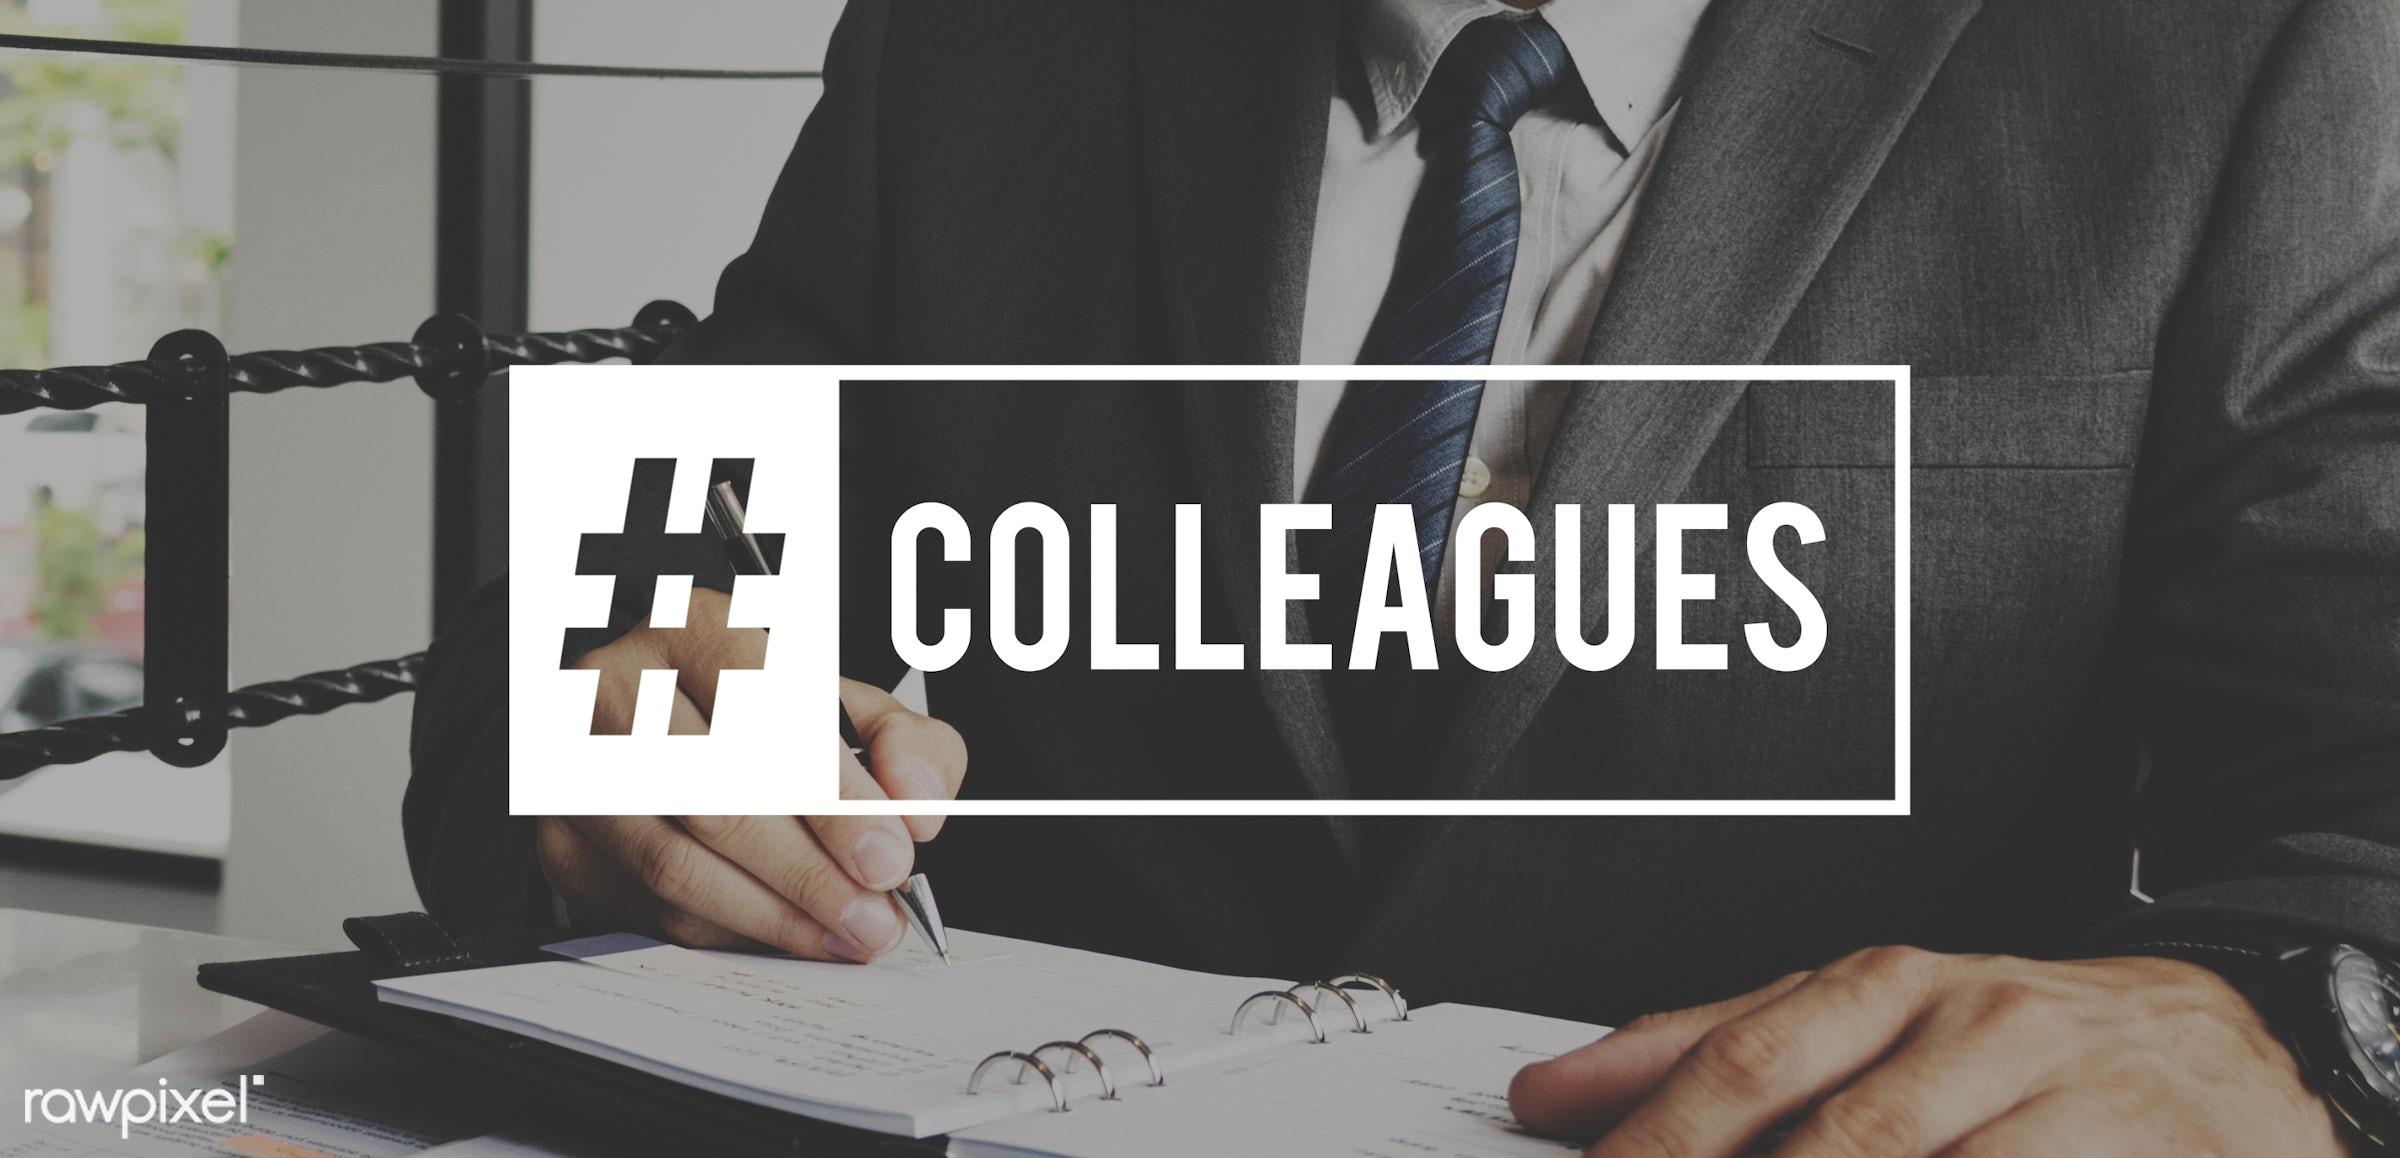 success, administration, adult, agenda, brainstorm, brainstorming, business, businessman, colleagues, communication, company...